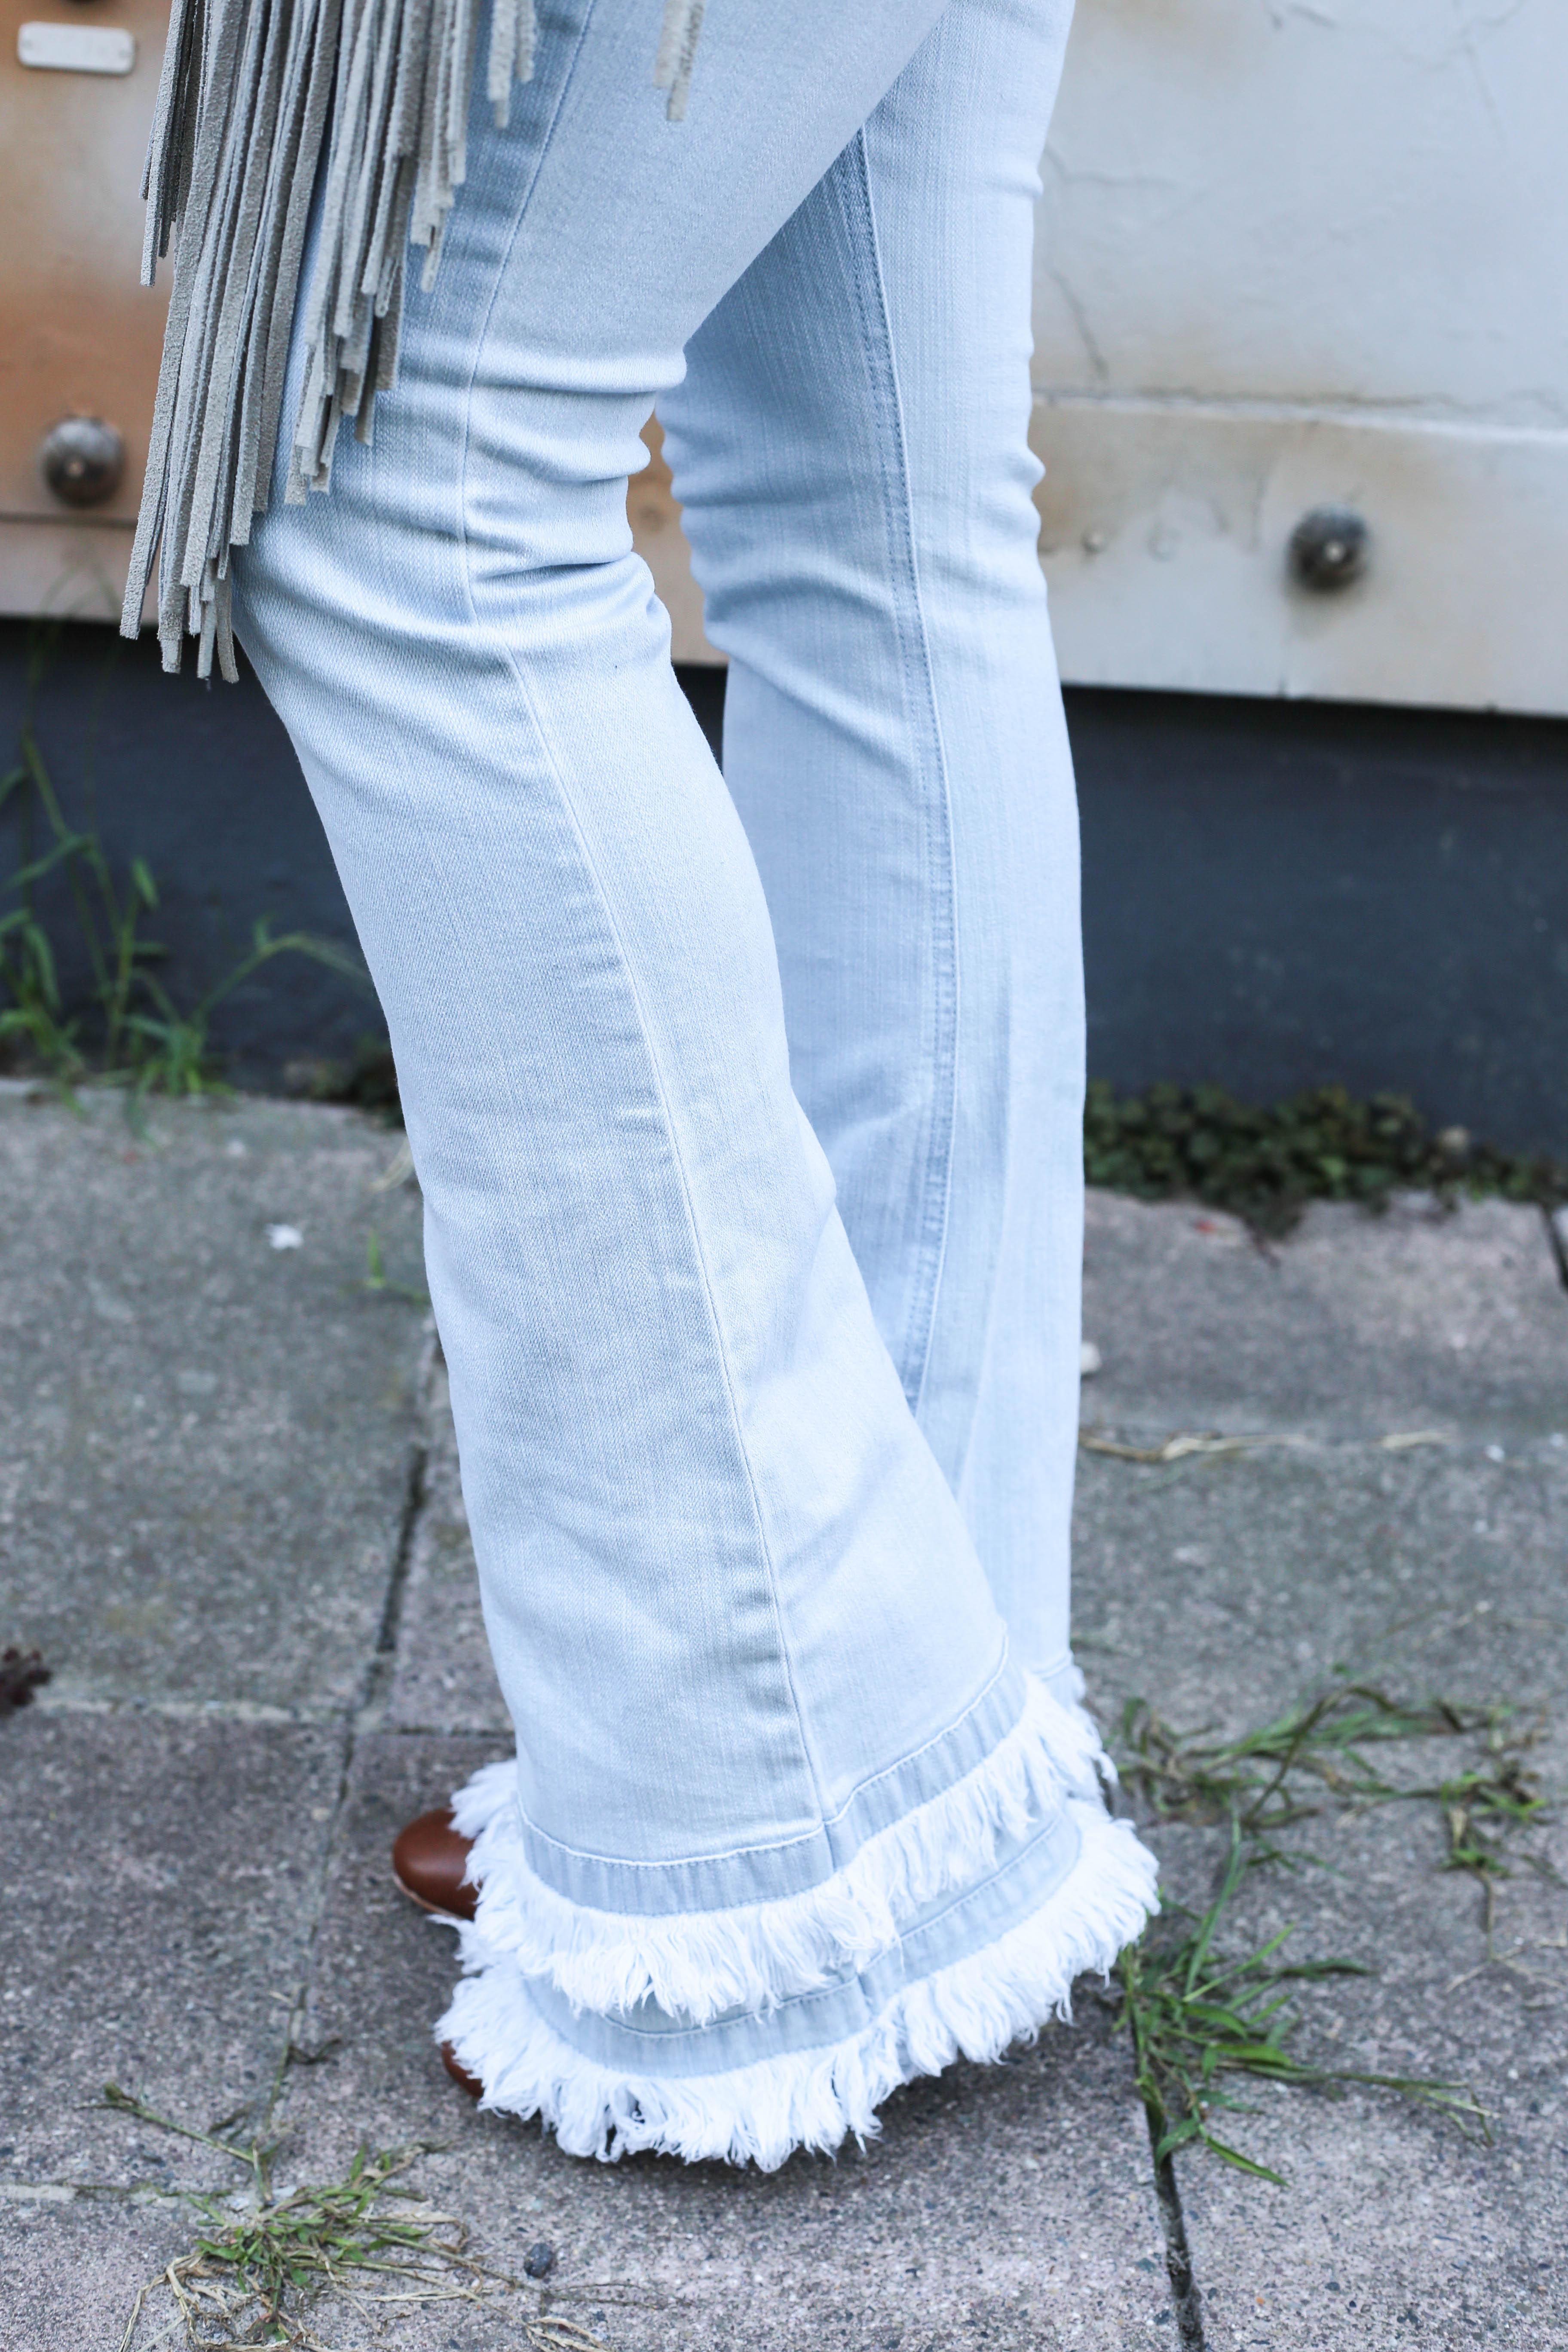 festival-look-fashionblog-berlin-modeblog-outfit-schlaghose-flared-jeans_1683